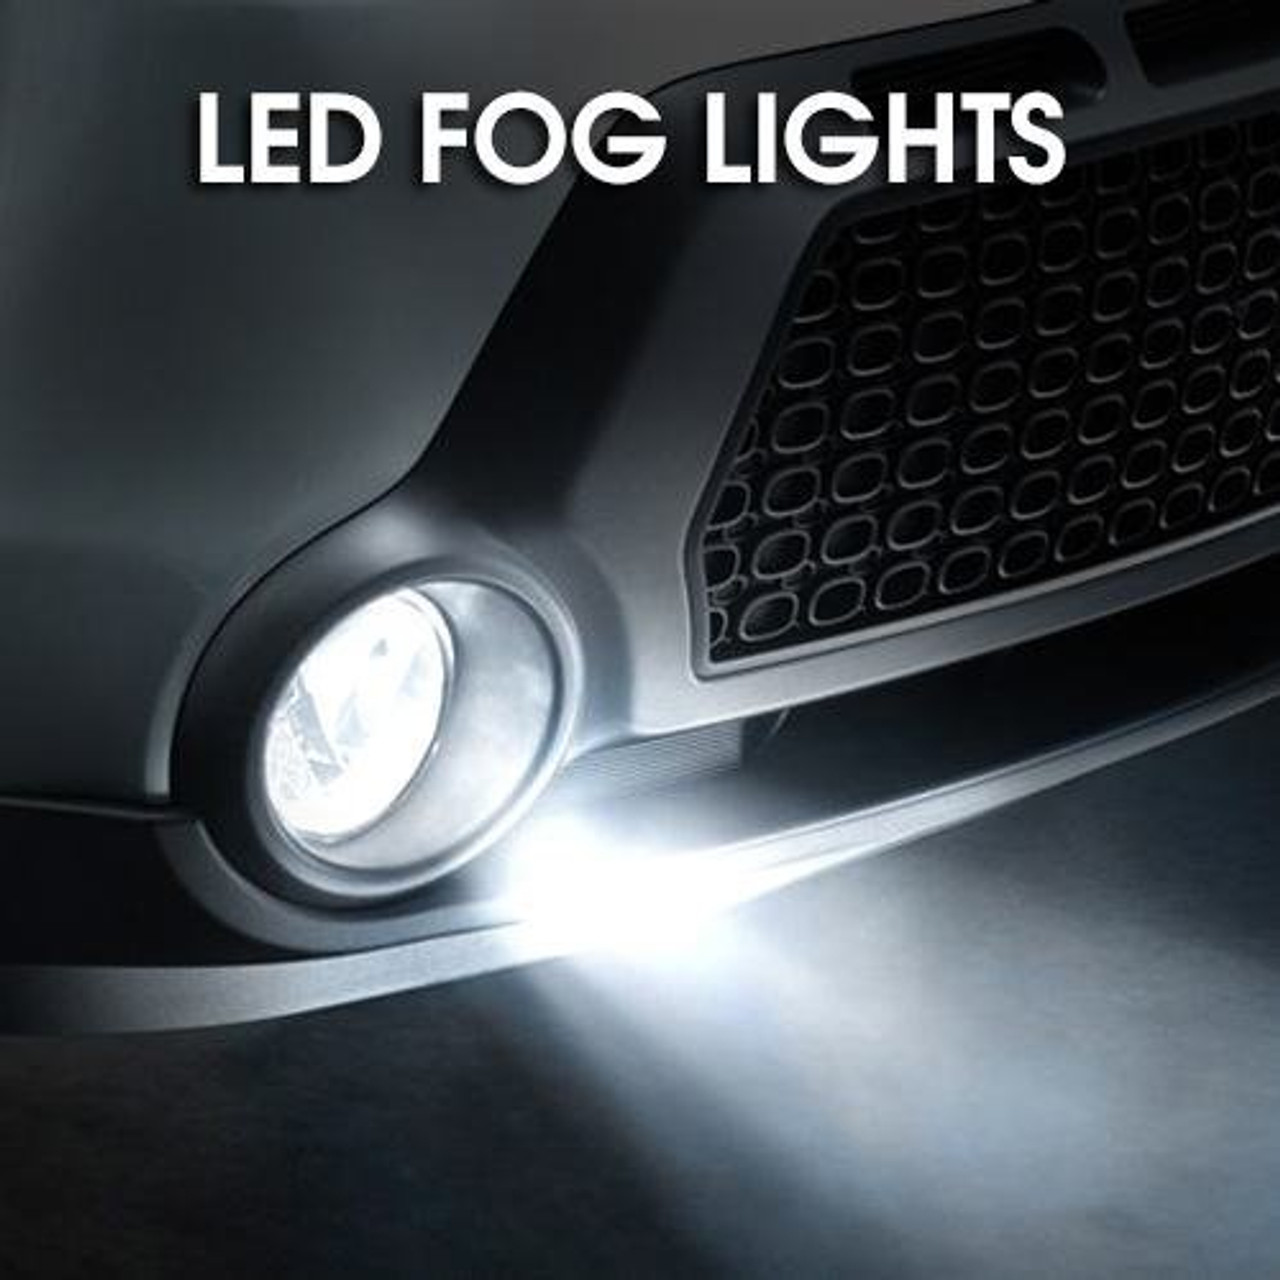 Nissan Maxima Premium Fog Light LED Package (2009-Present)